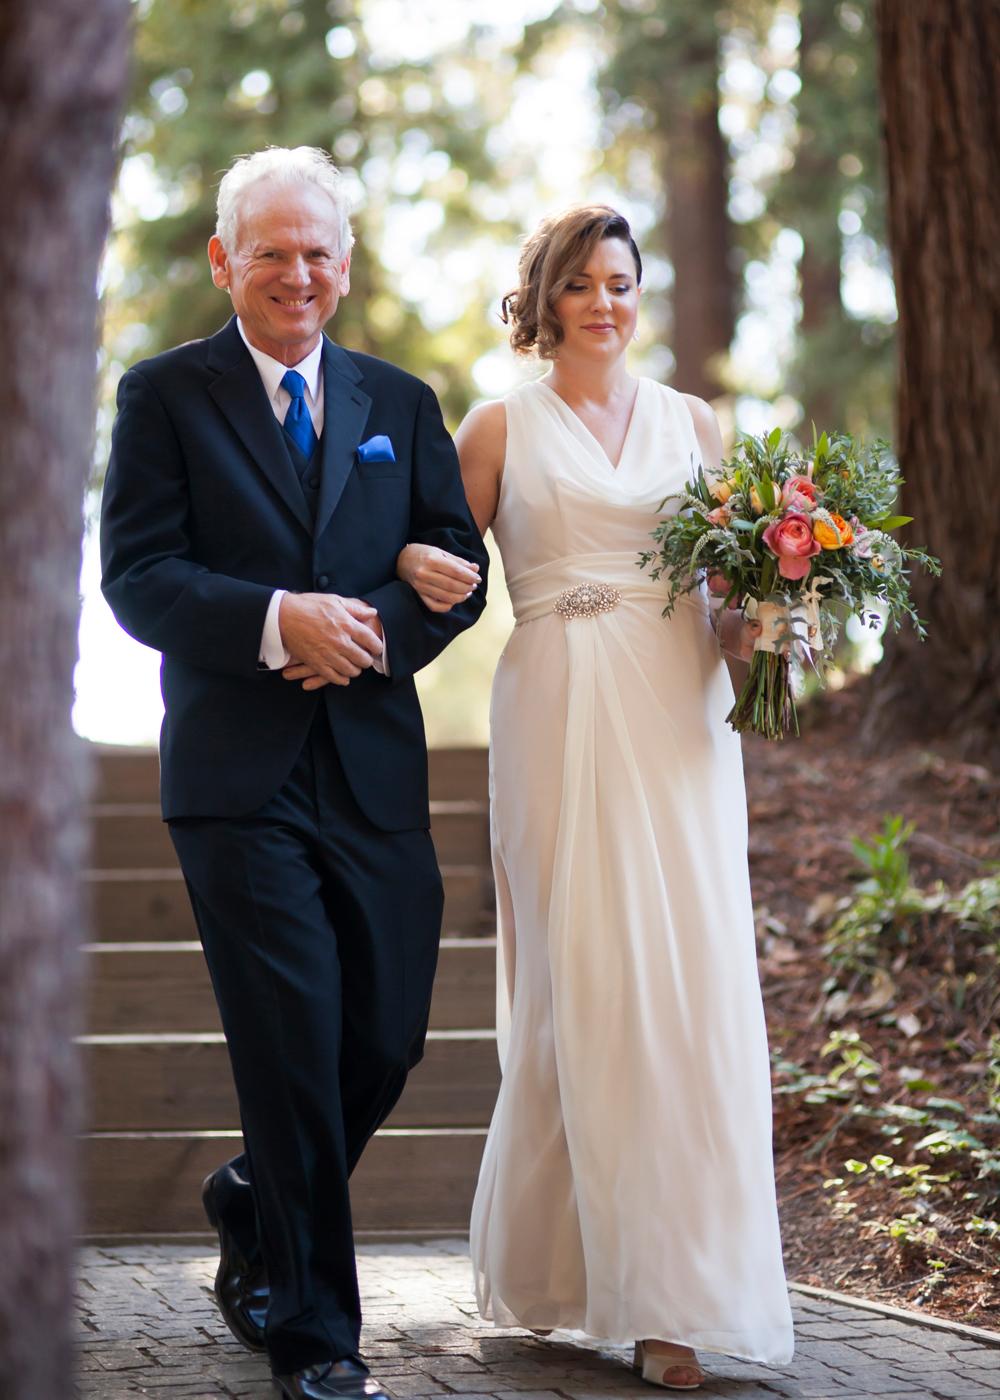 pema-osel-ling-santa-cruz-wedding-photography-lilouette-38.jpg